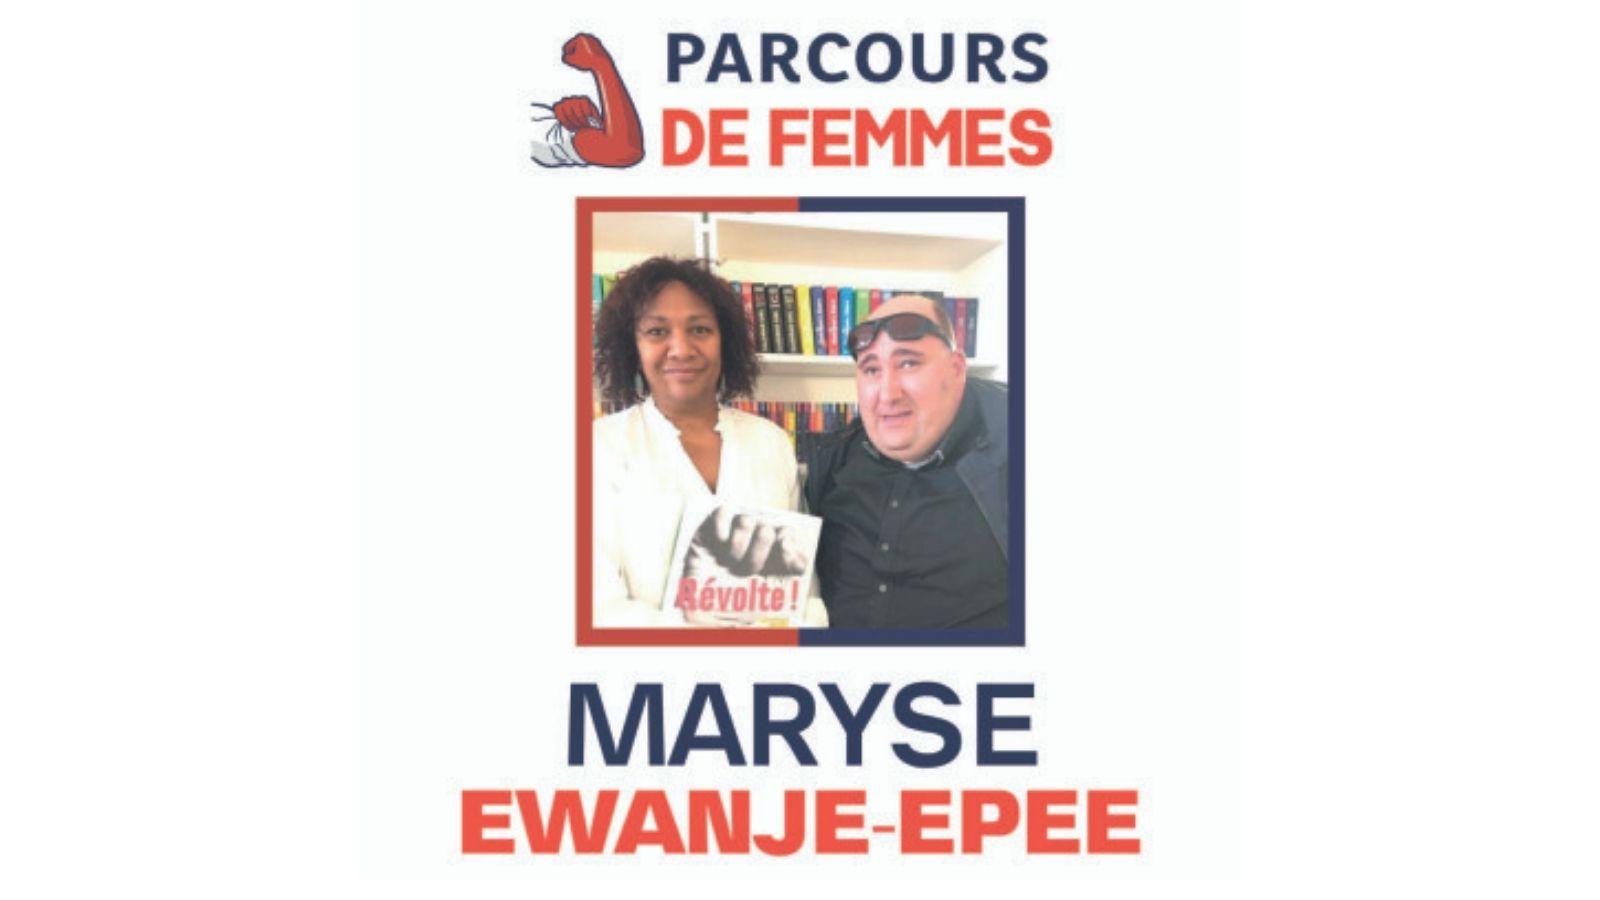 Maryse Éwanjé-Épée